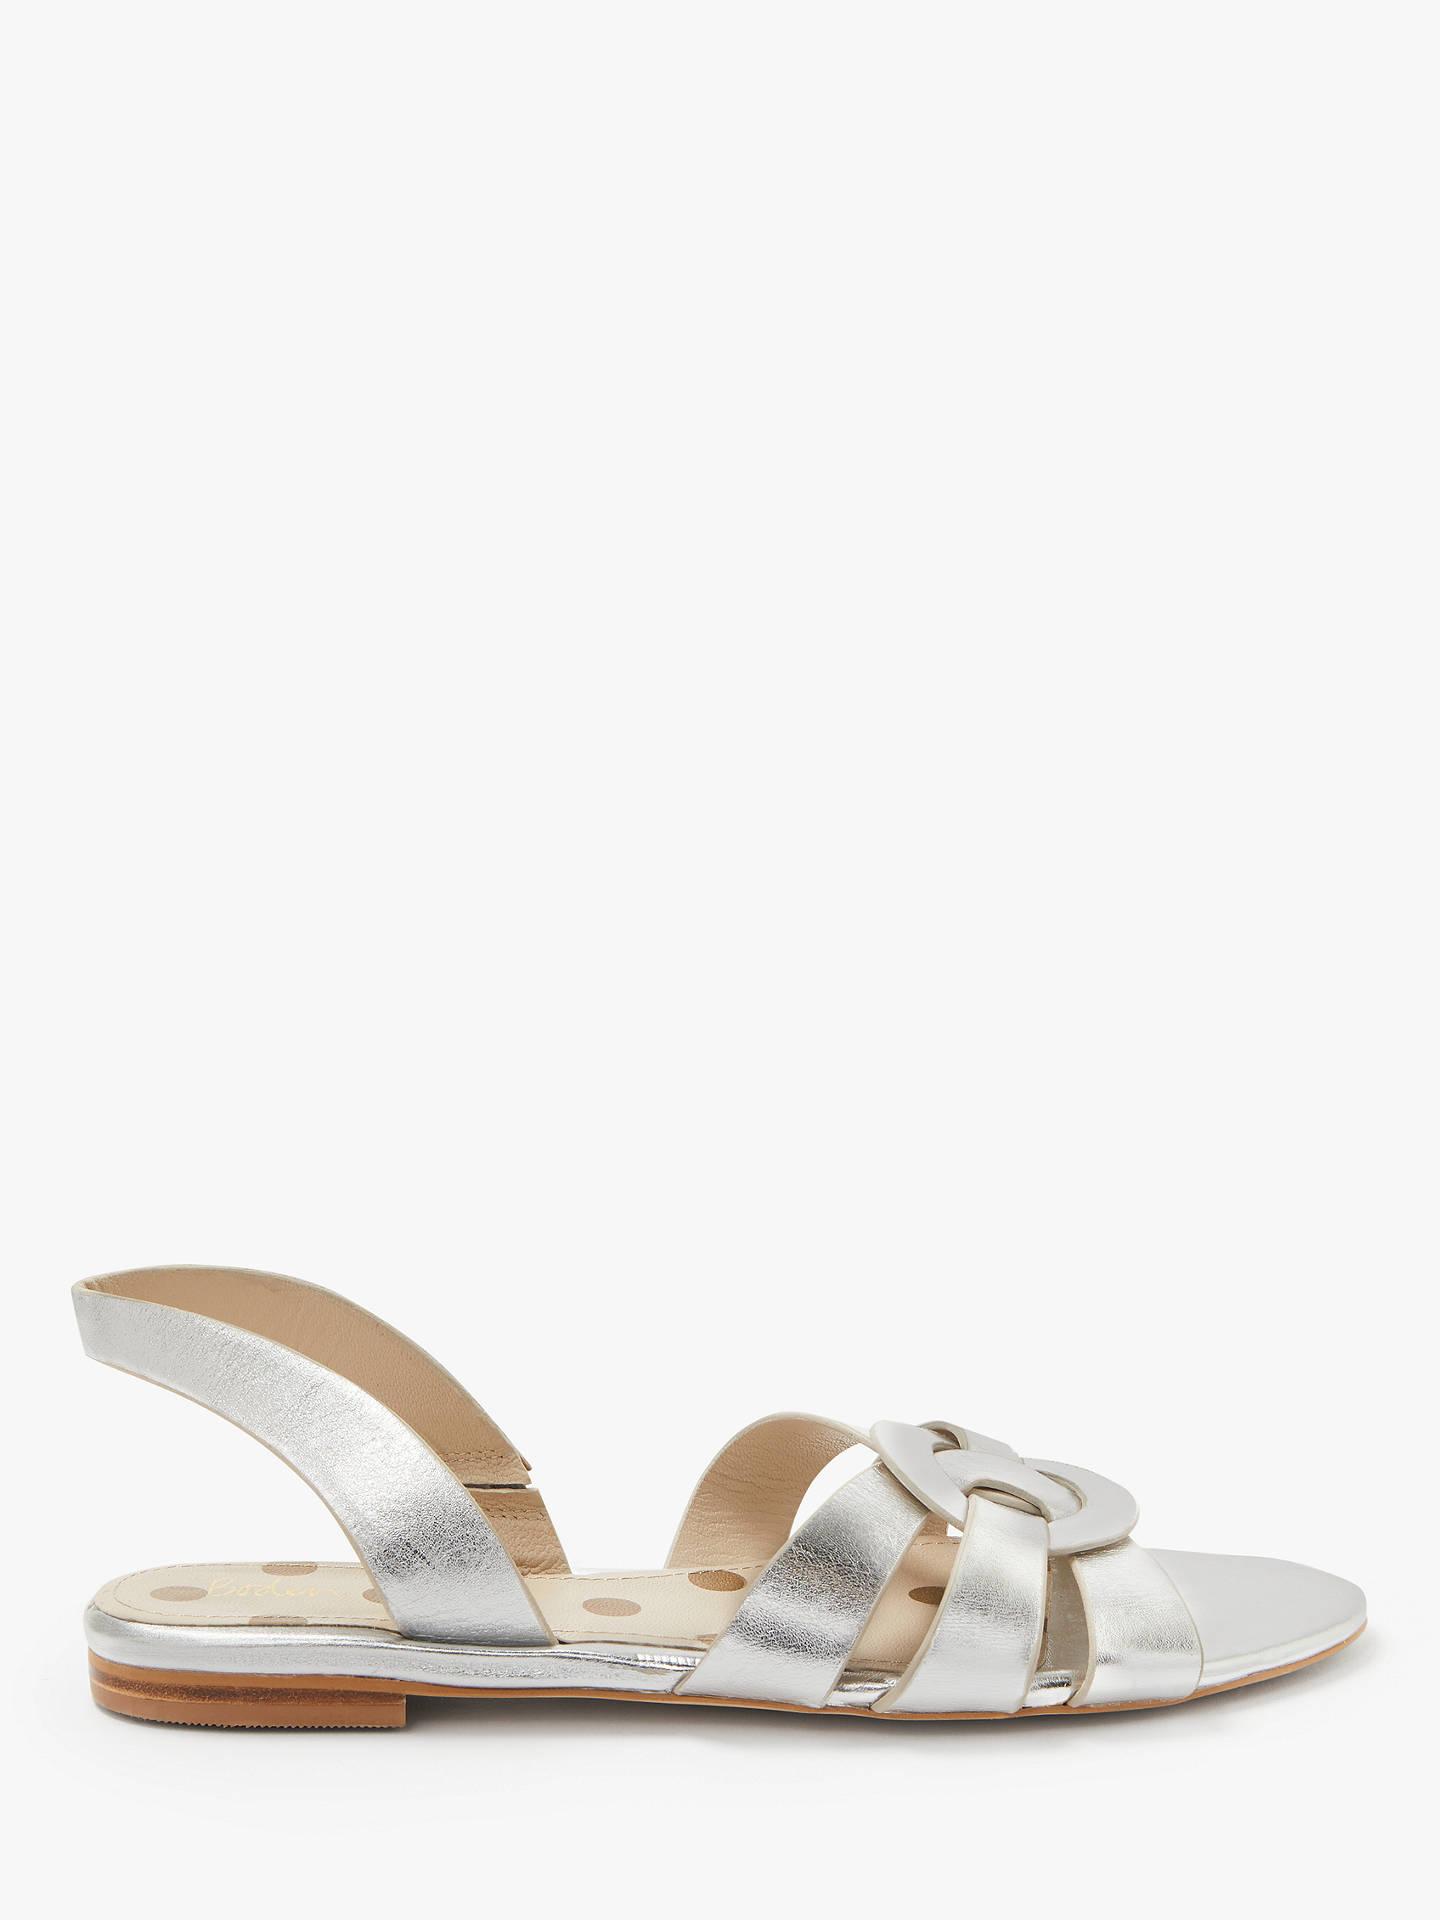 Boden Adora Slingback Sandals At John Lewis Amp Partners